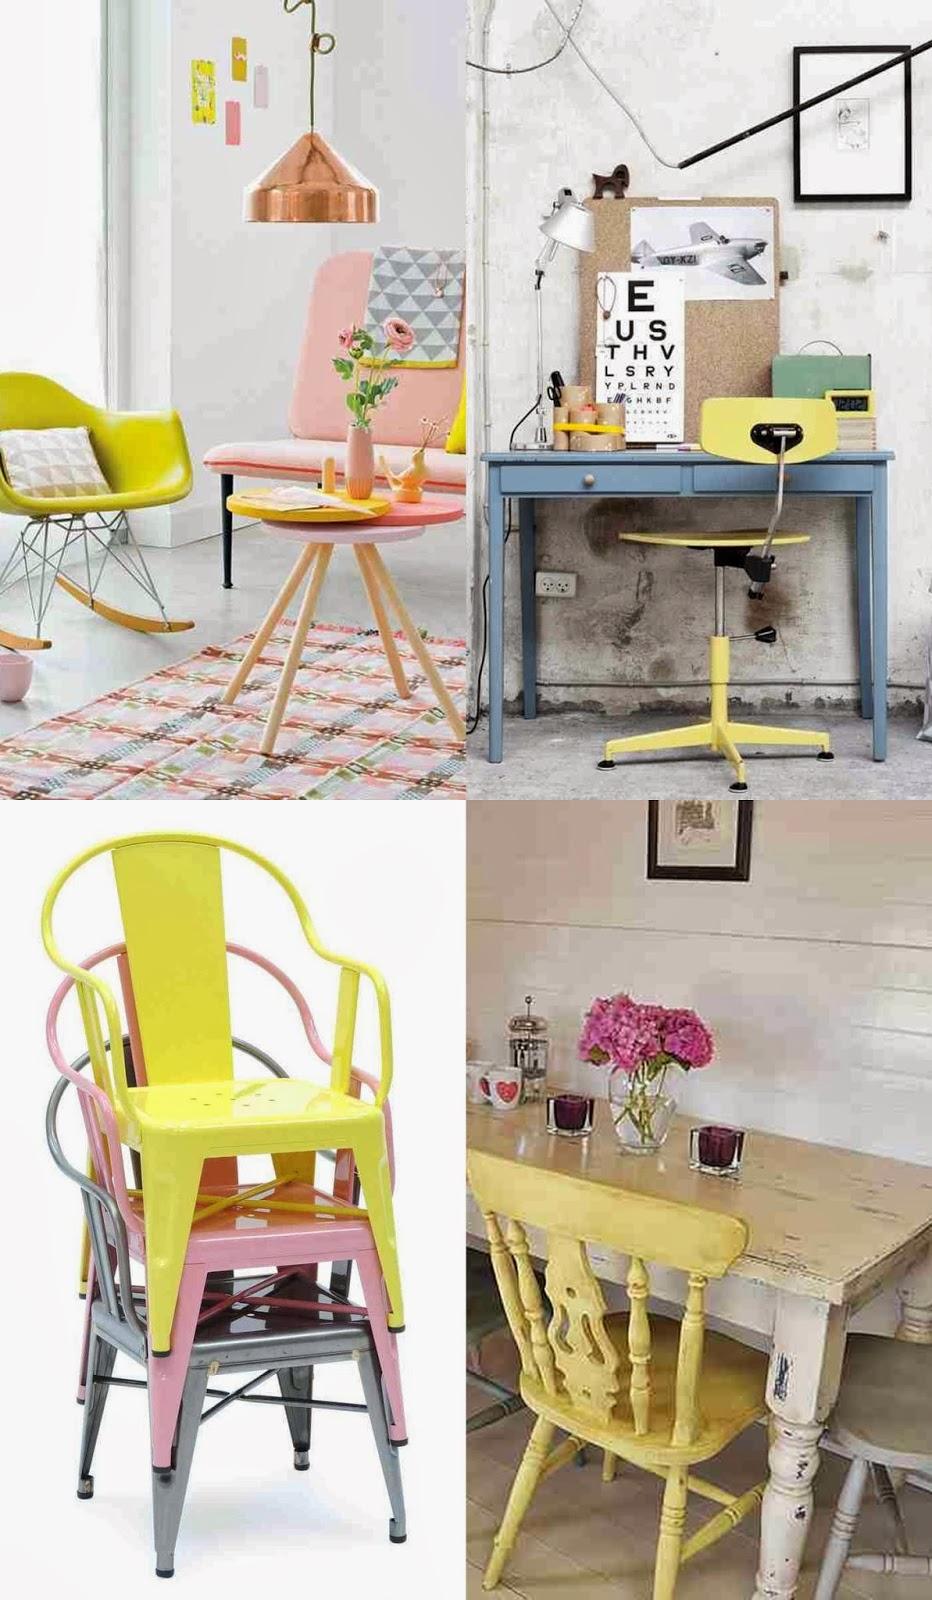 Pastel tolix, pastel yellow chairs, yellow rocker eames